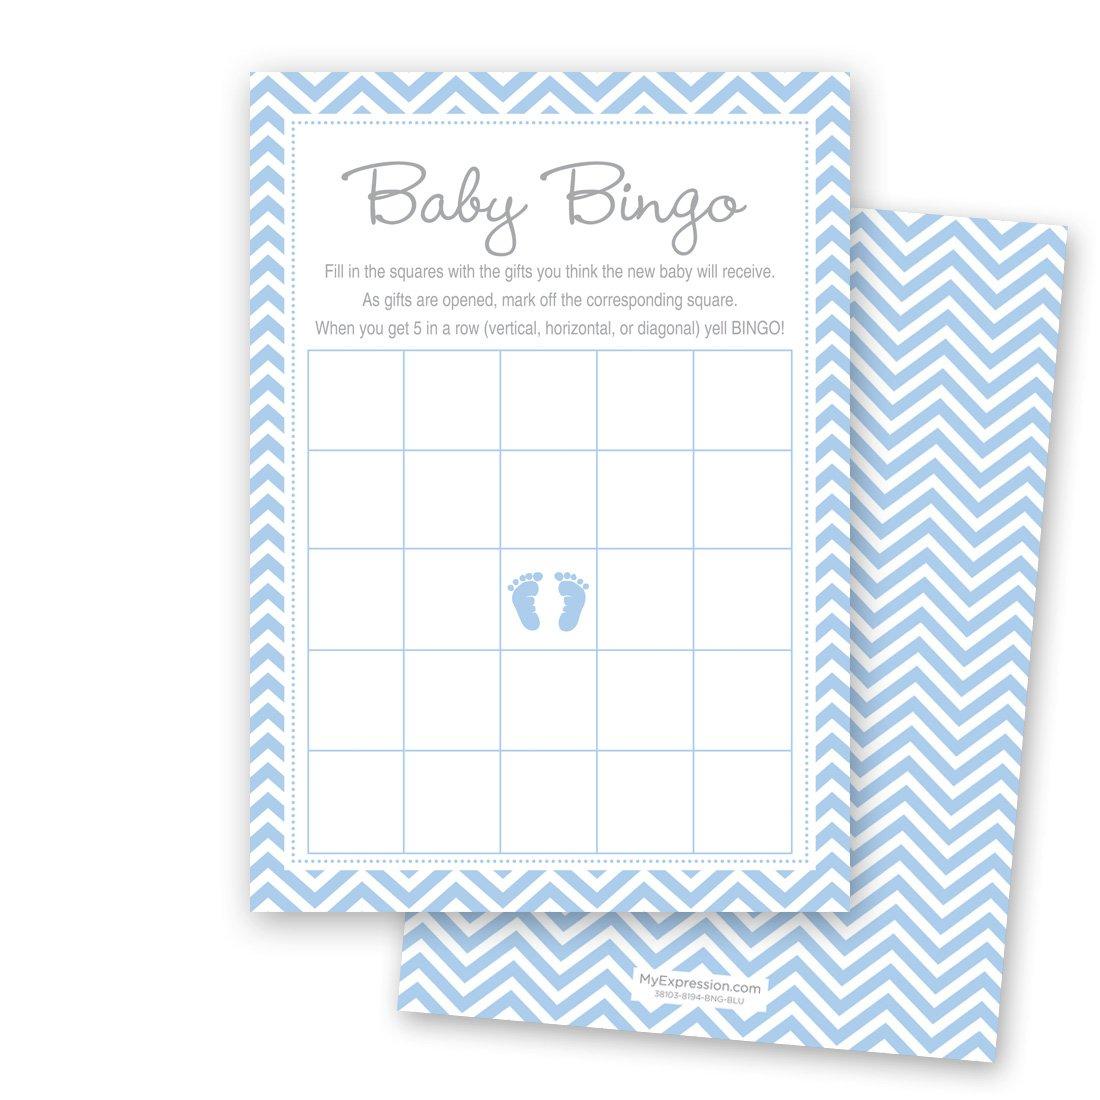 MyExpression.com 24 Cnt Blue Baby Feet Footprint Baby Bingo Cards by MyExpression.com